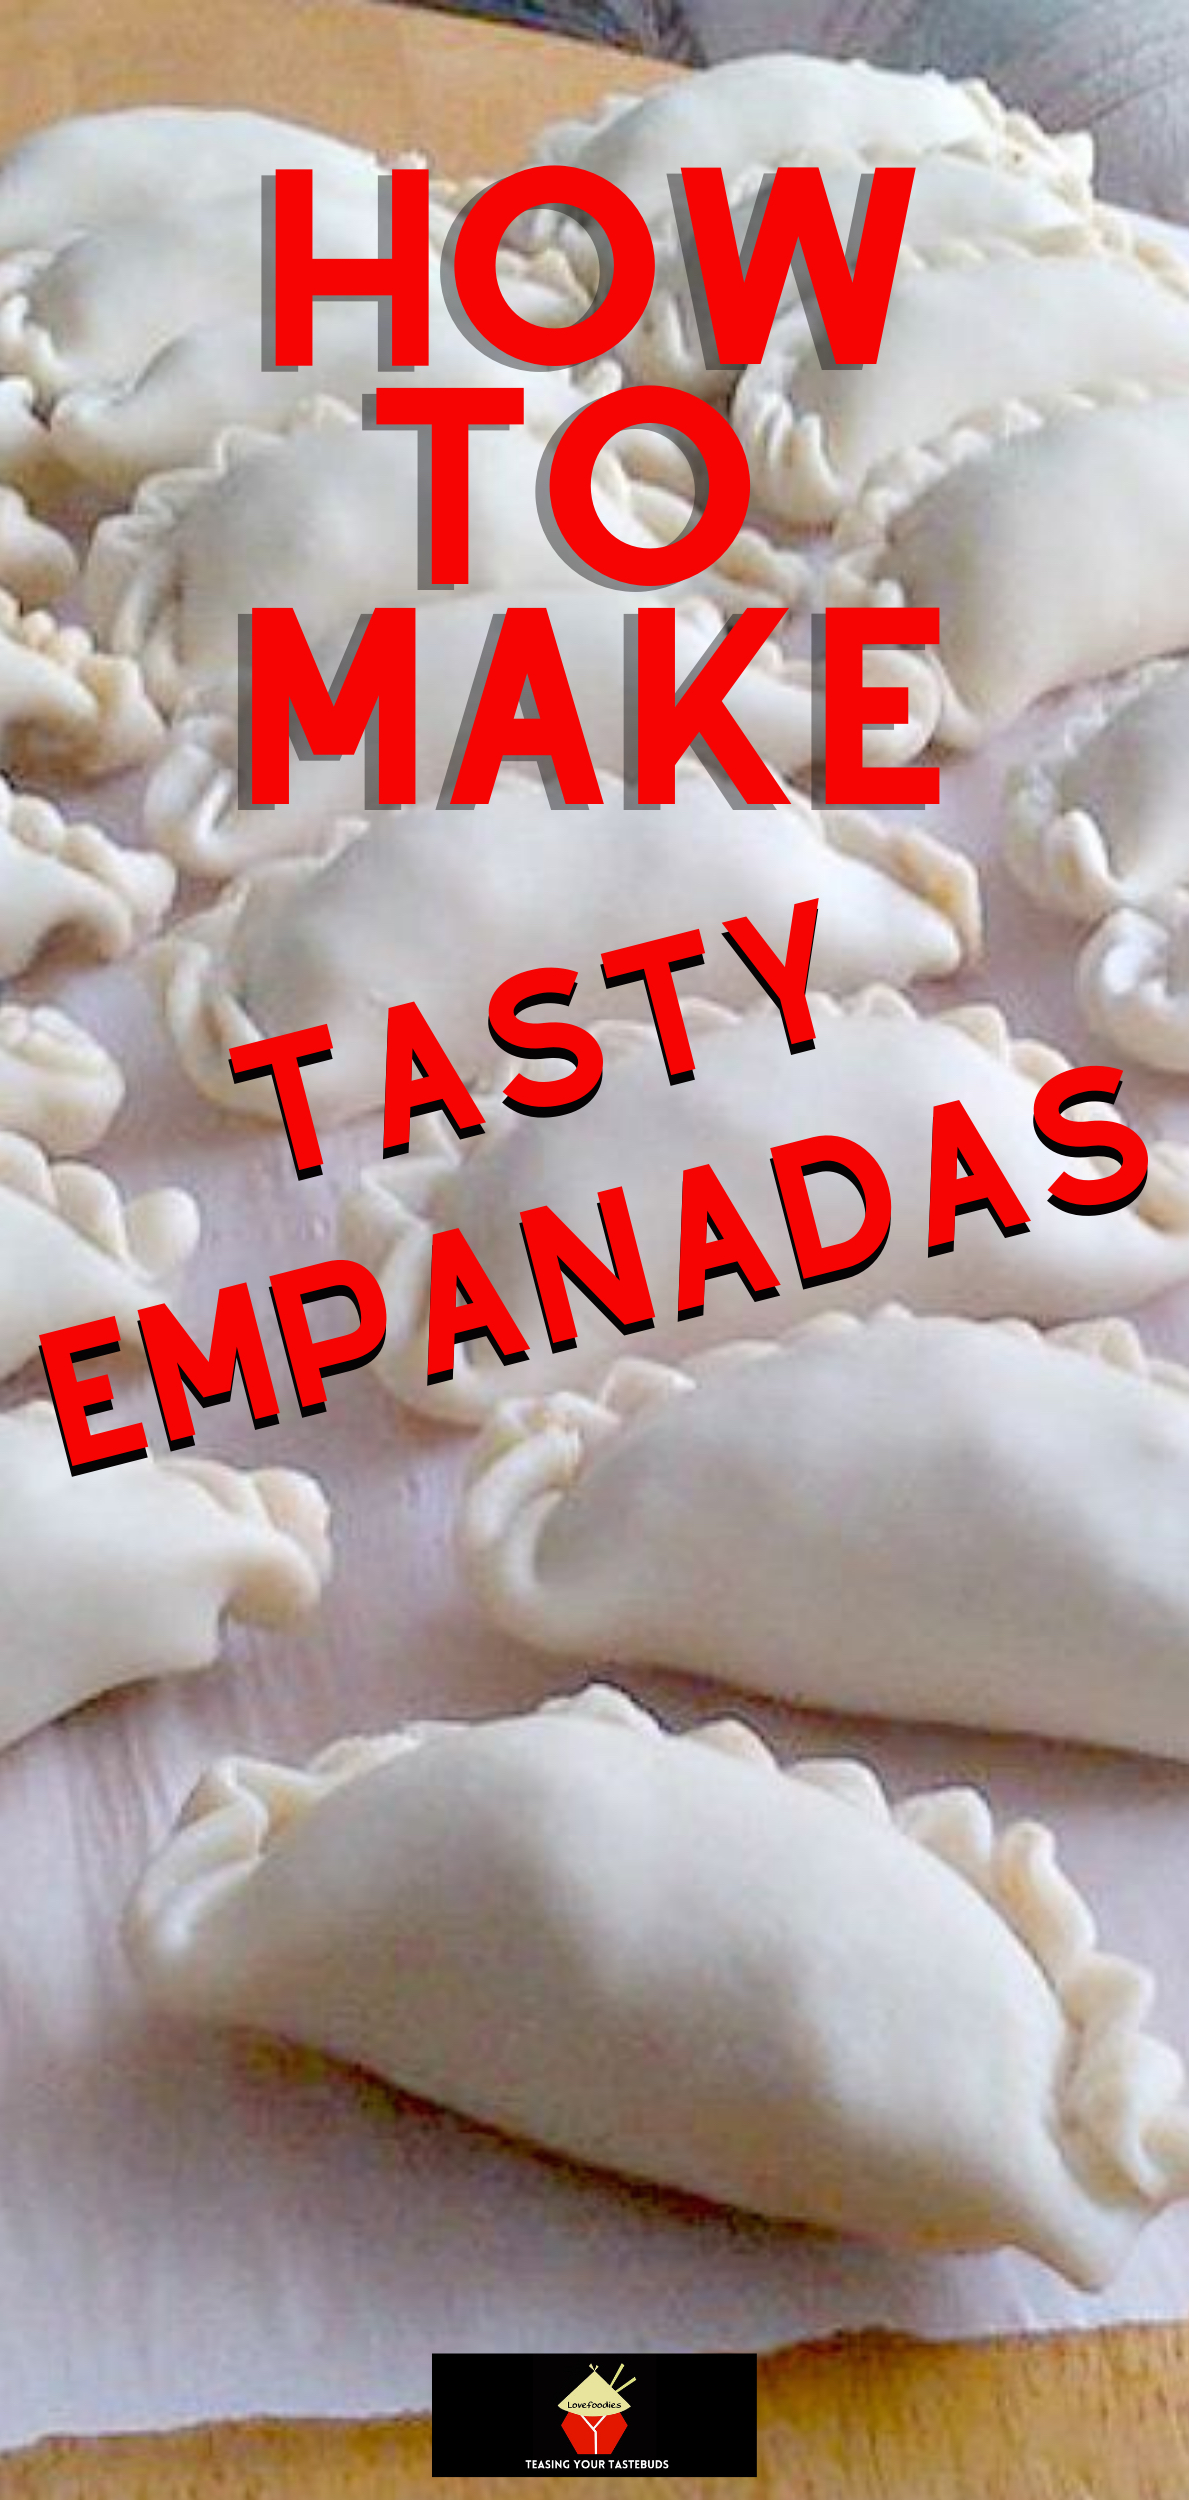 Tasty EmpanadasP2